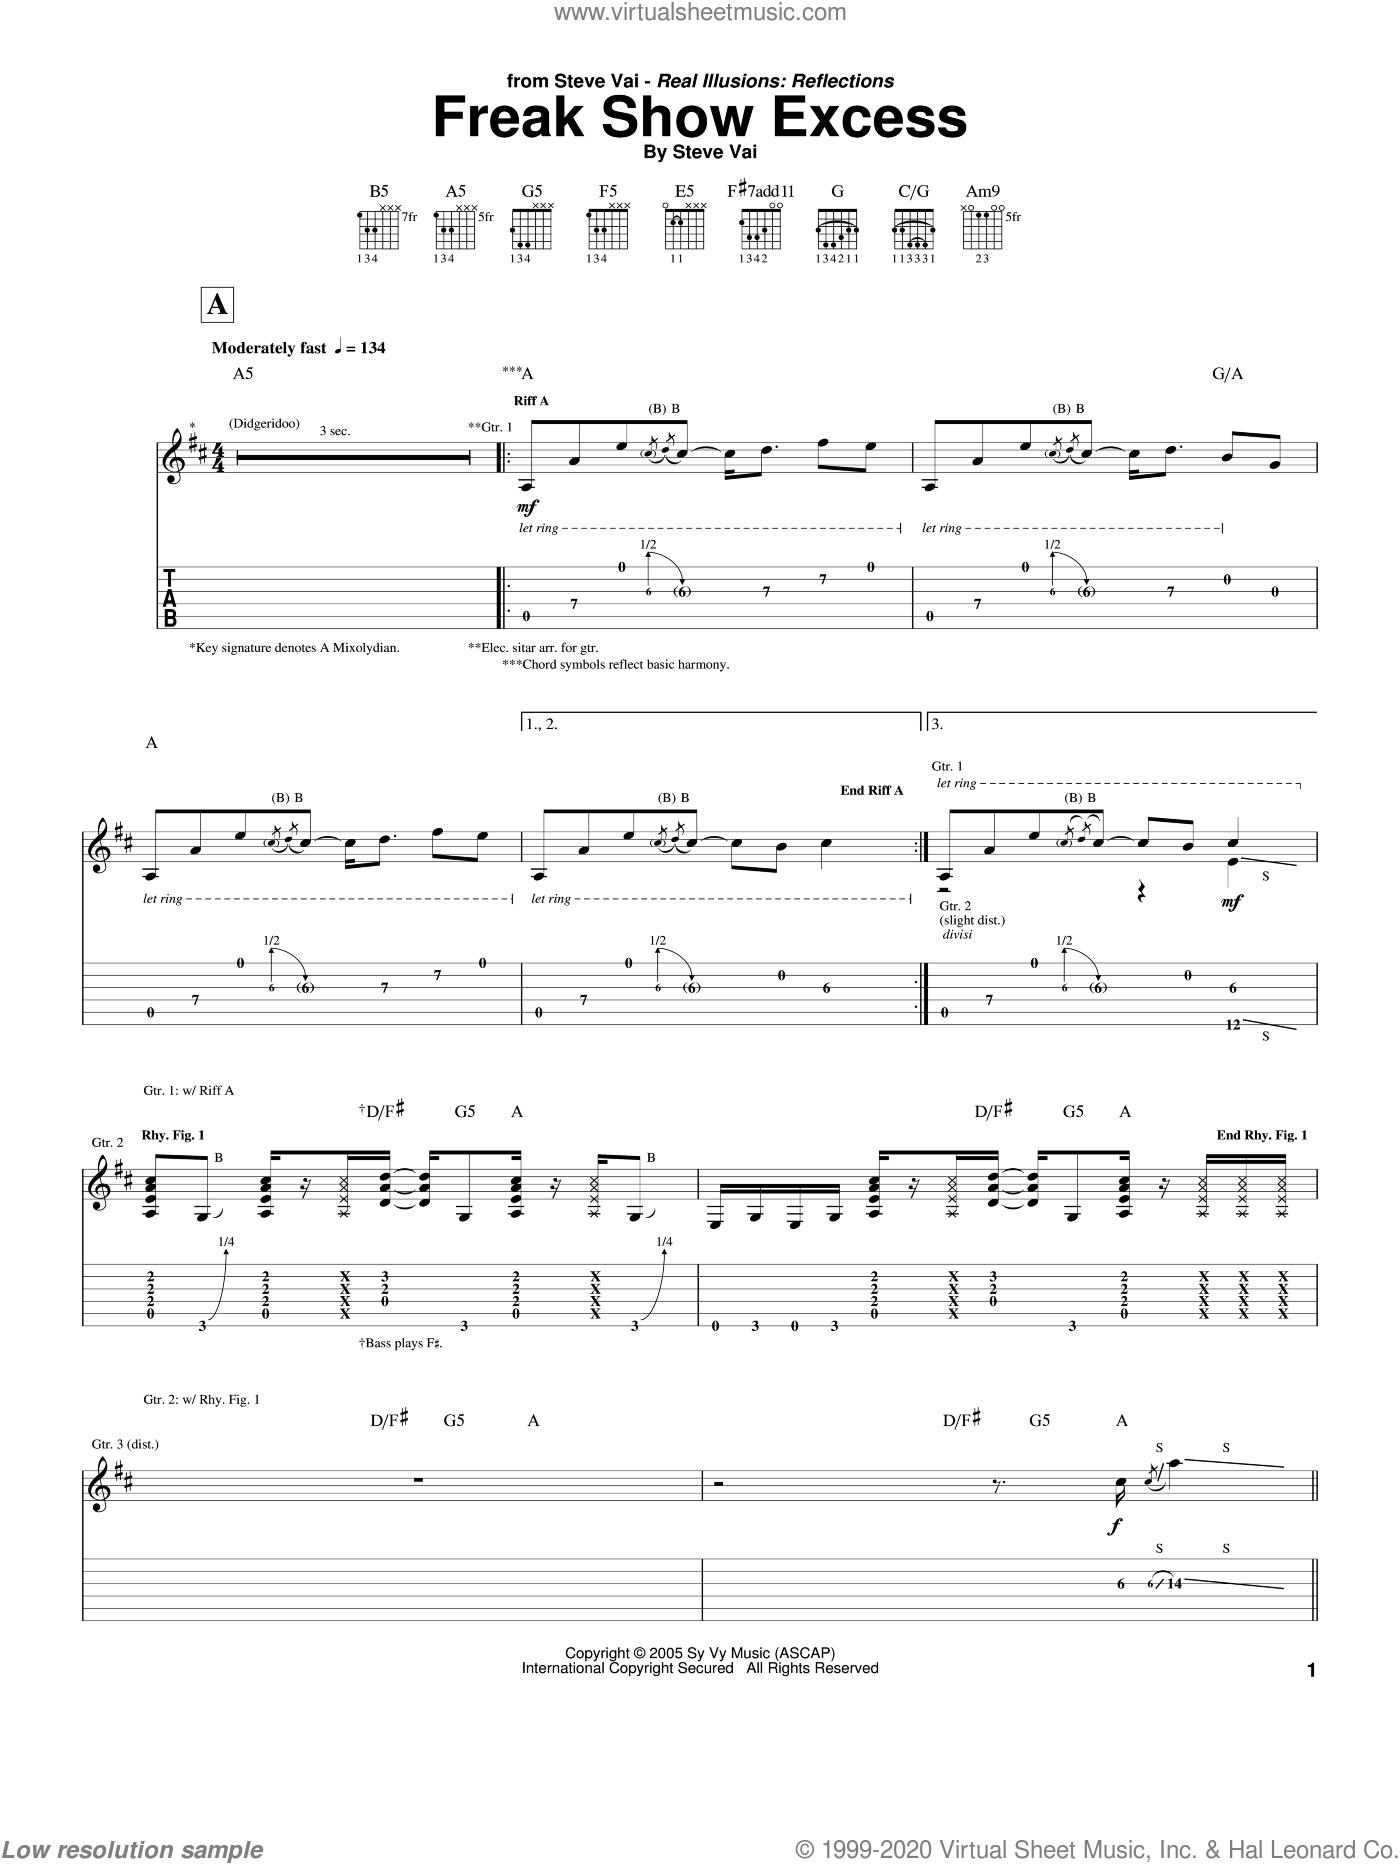 Freak Show Excess sheet music for guitar (tablature) by Steve Vai, intermediate skill level